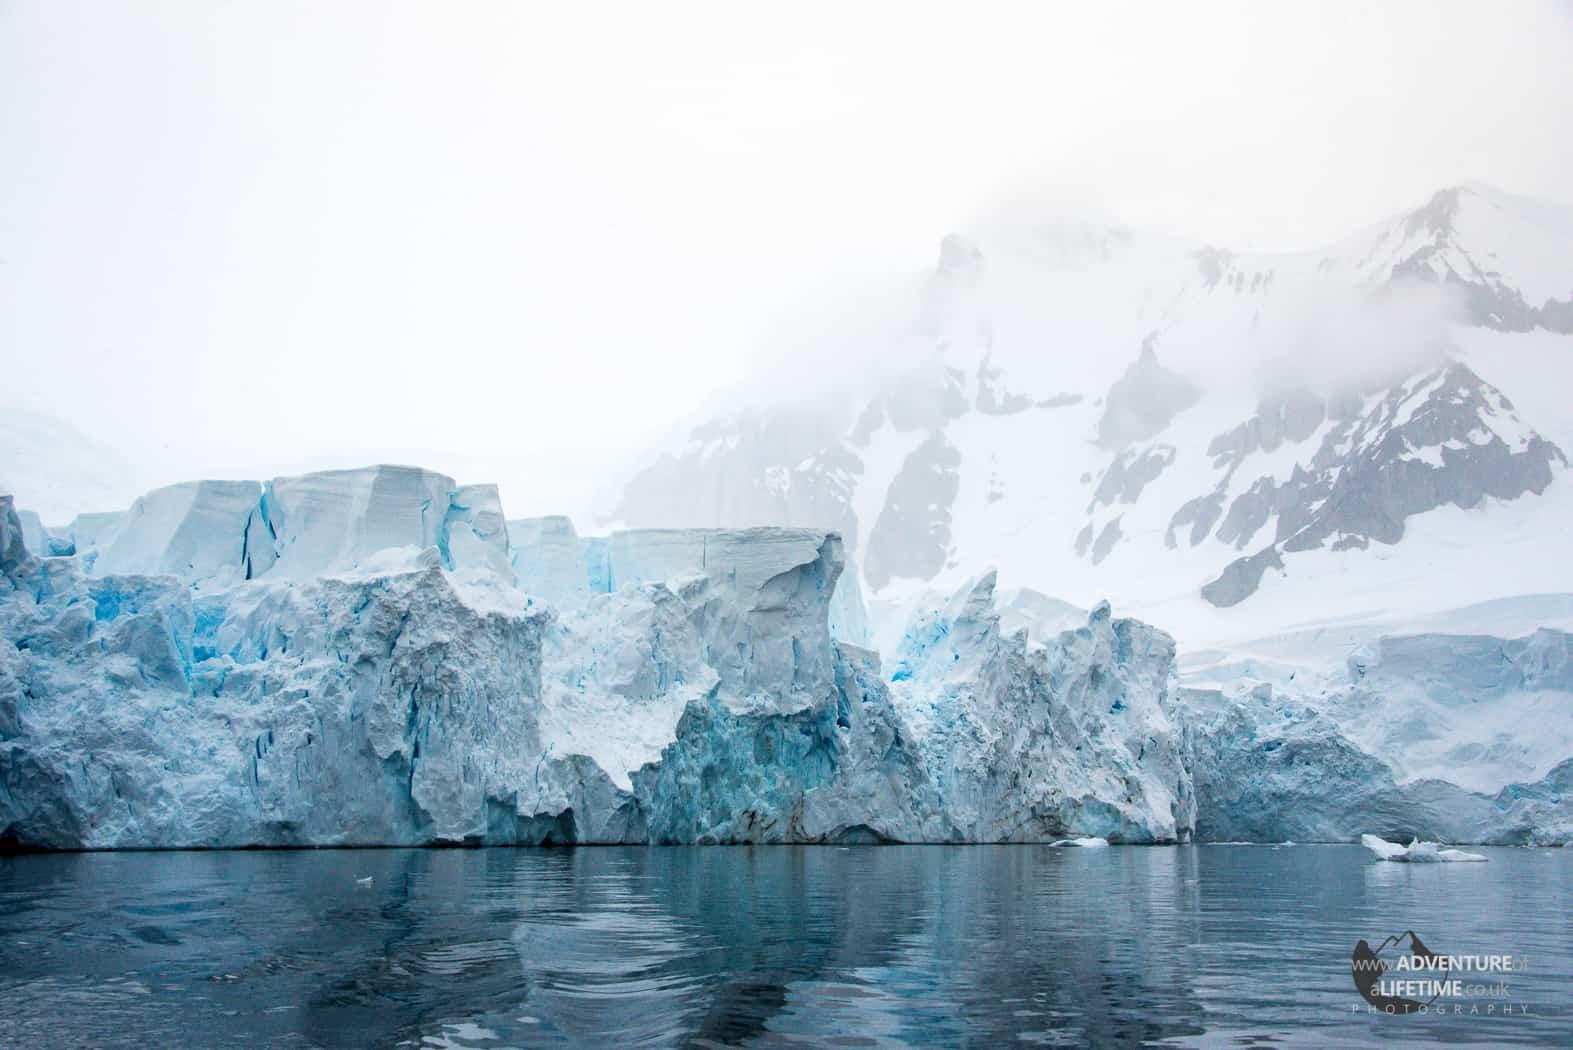 Antarcticas Mountain and Glacier